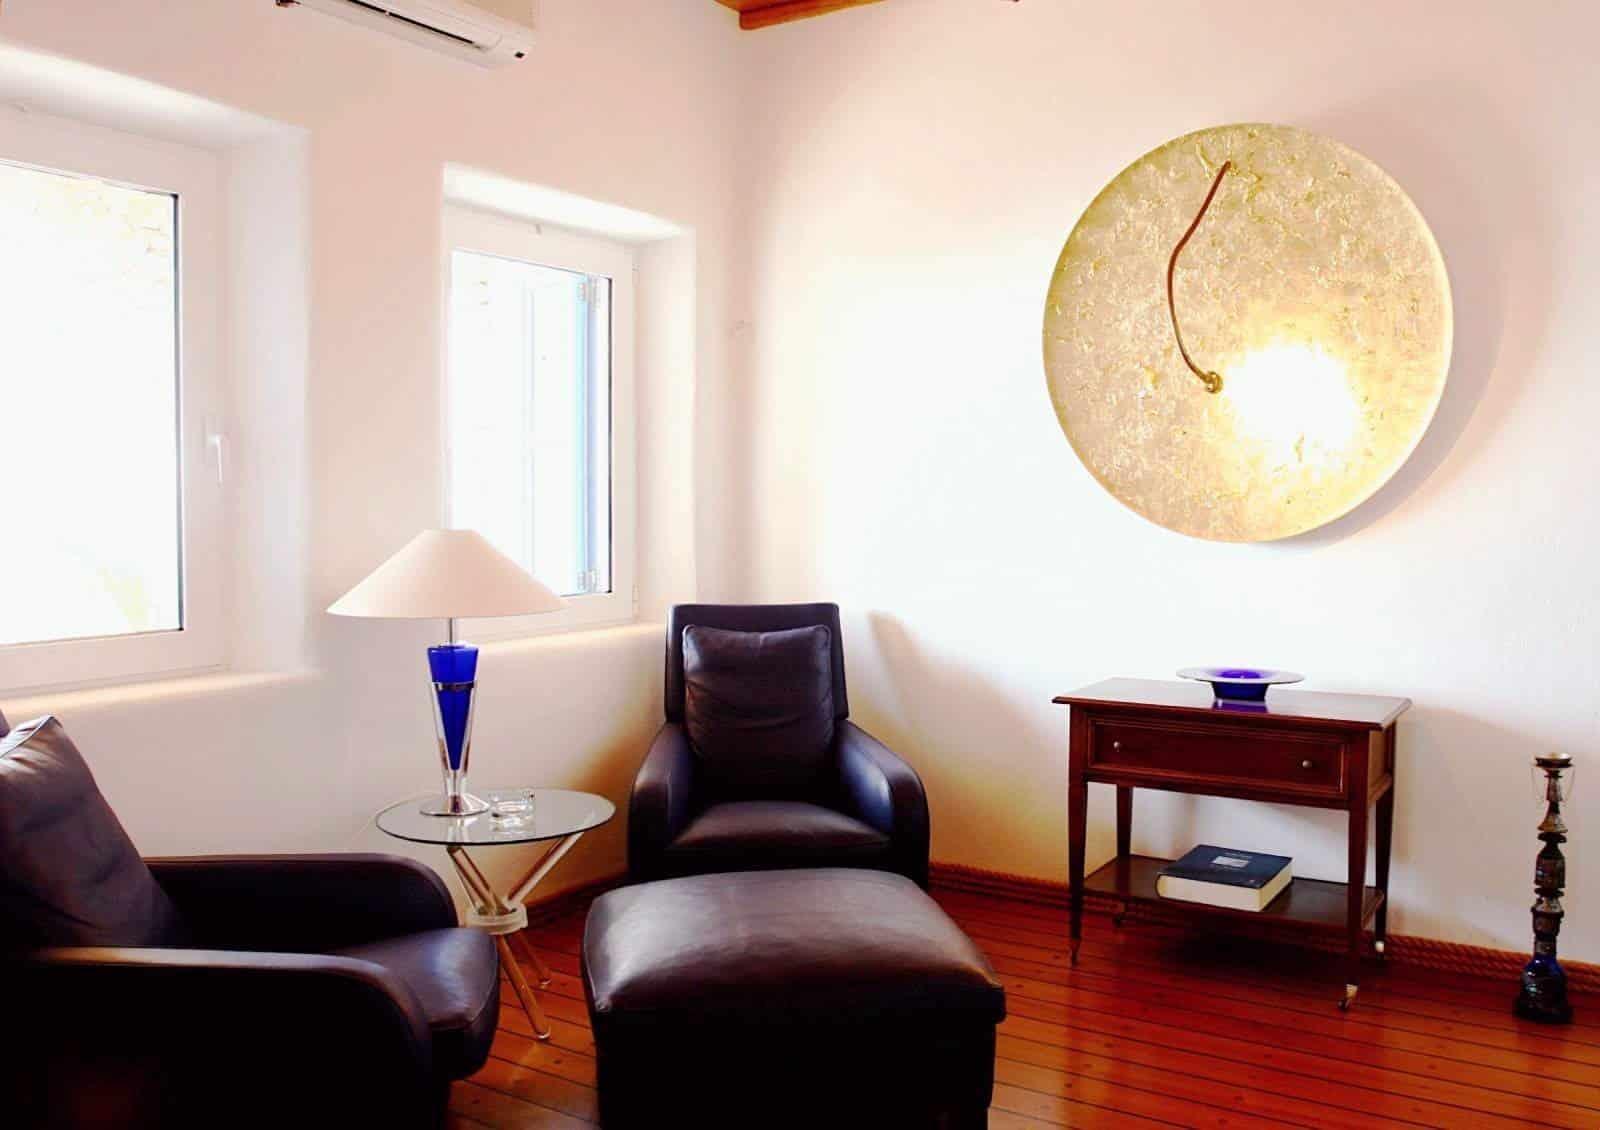 luxurious villa Mykonos - πολυτελής βίλα Μύκονος - mykonos services - οικοδομικές εργασίες 22